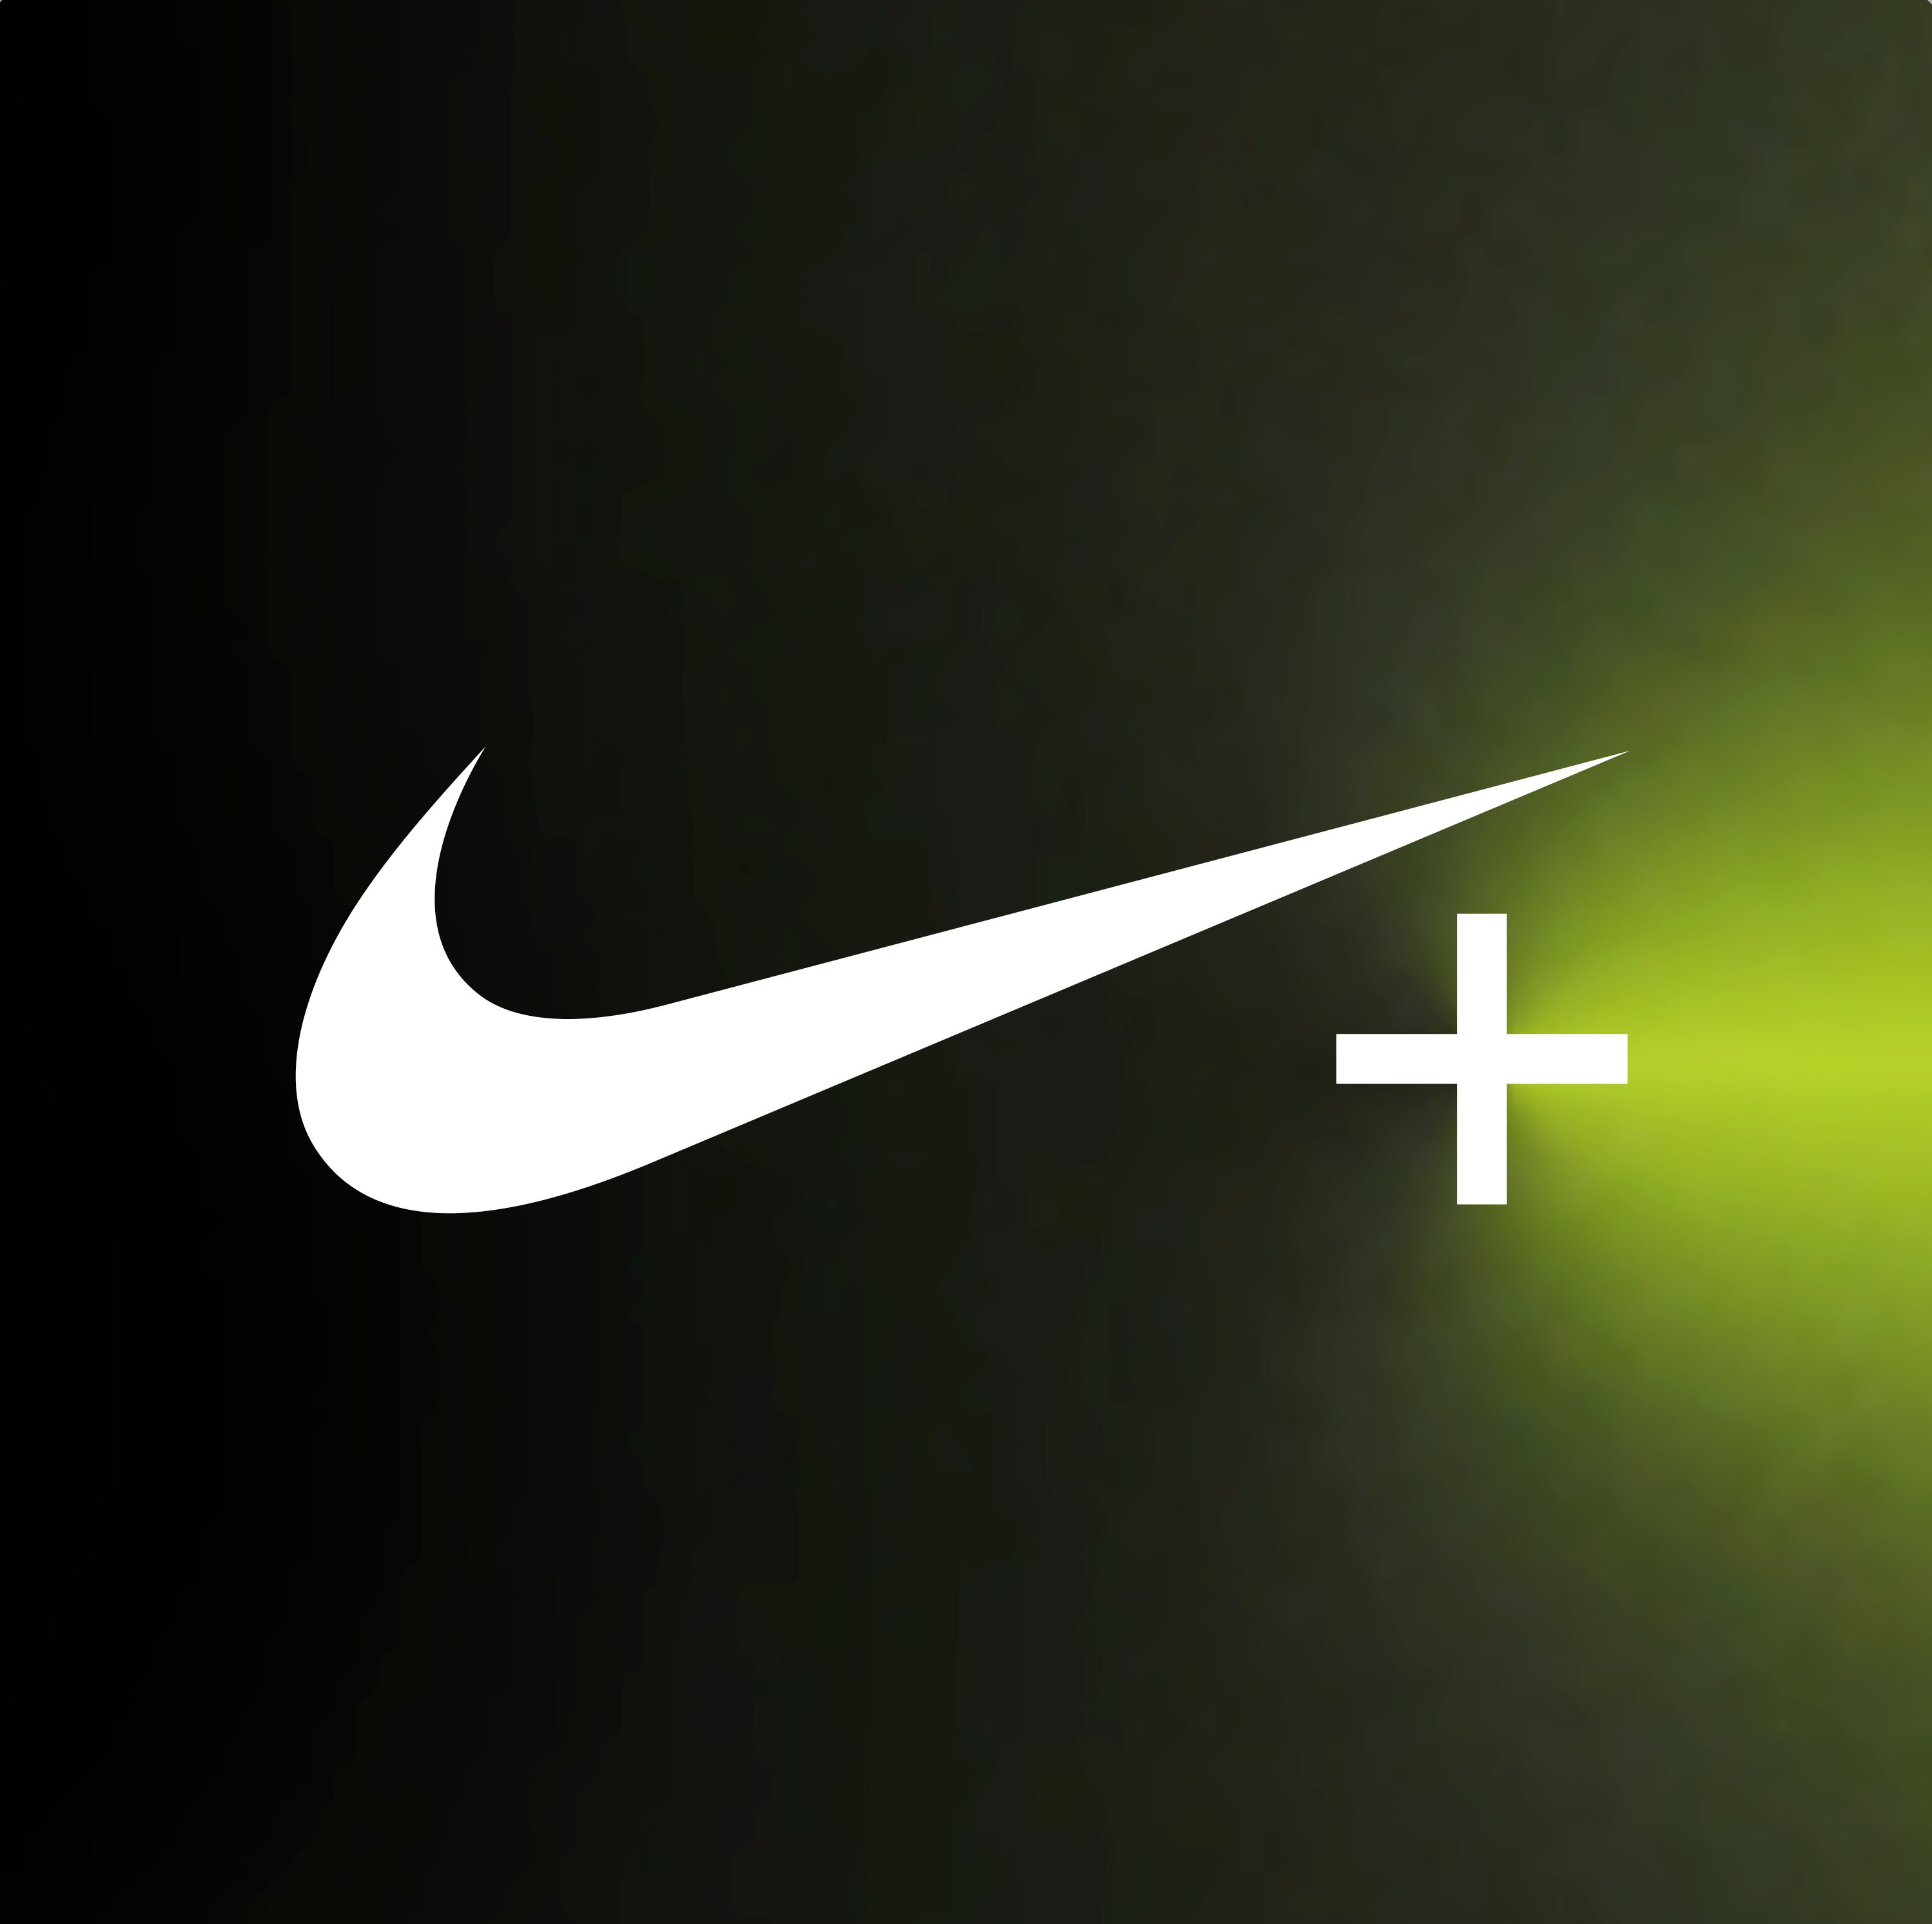 Nike-Plus-Icon-Only_original.jpg